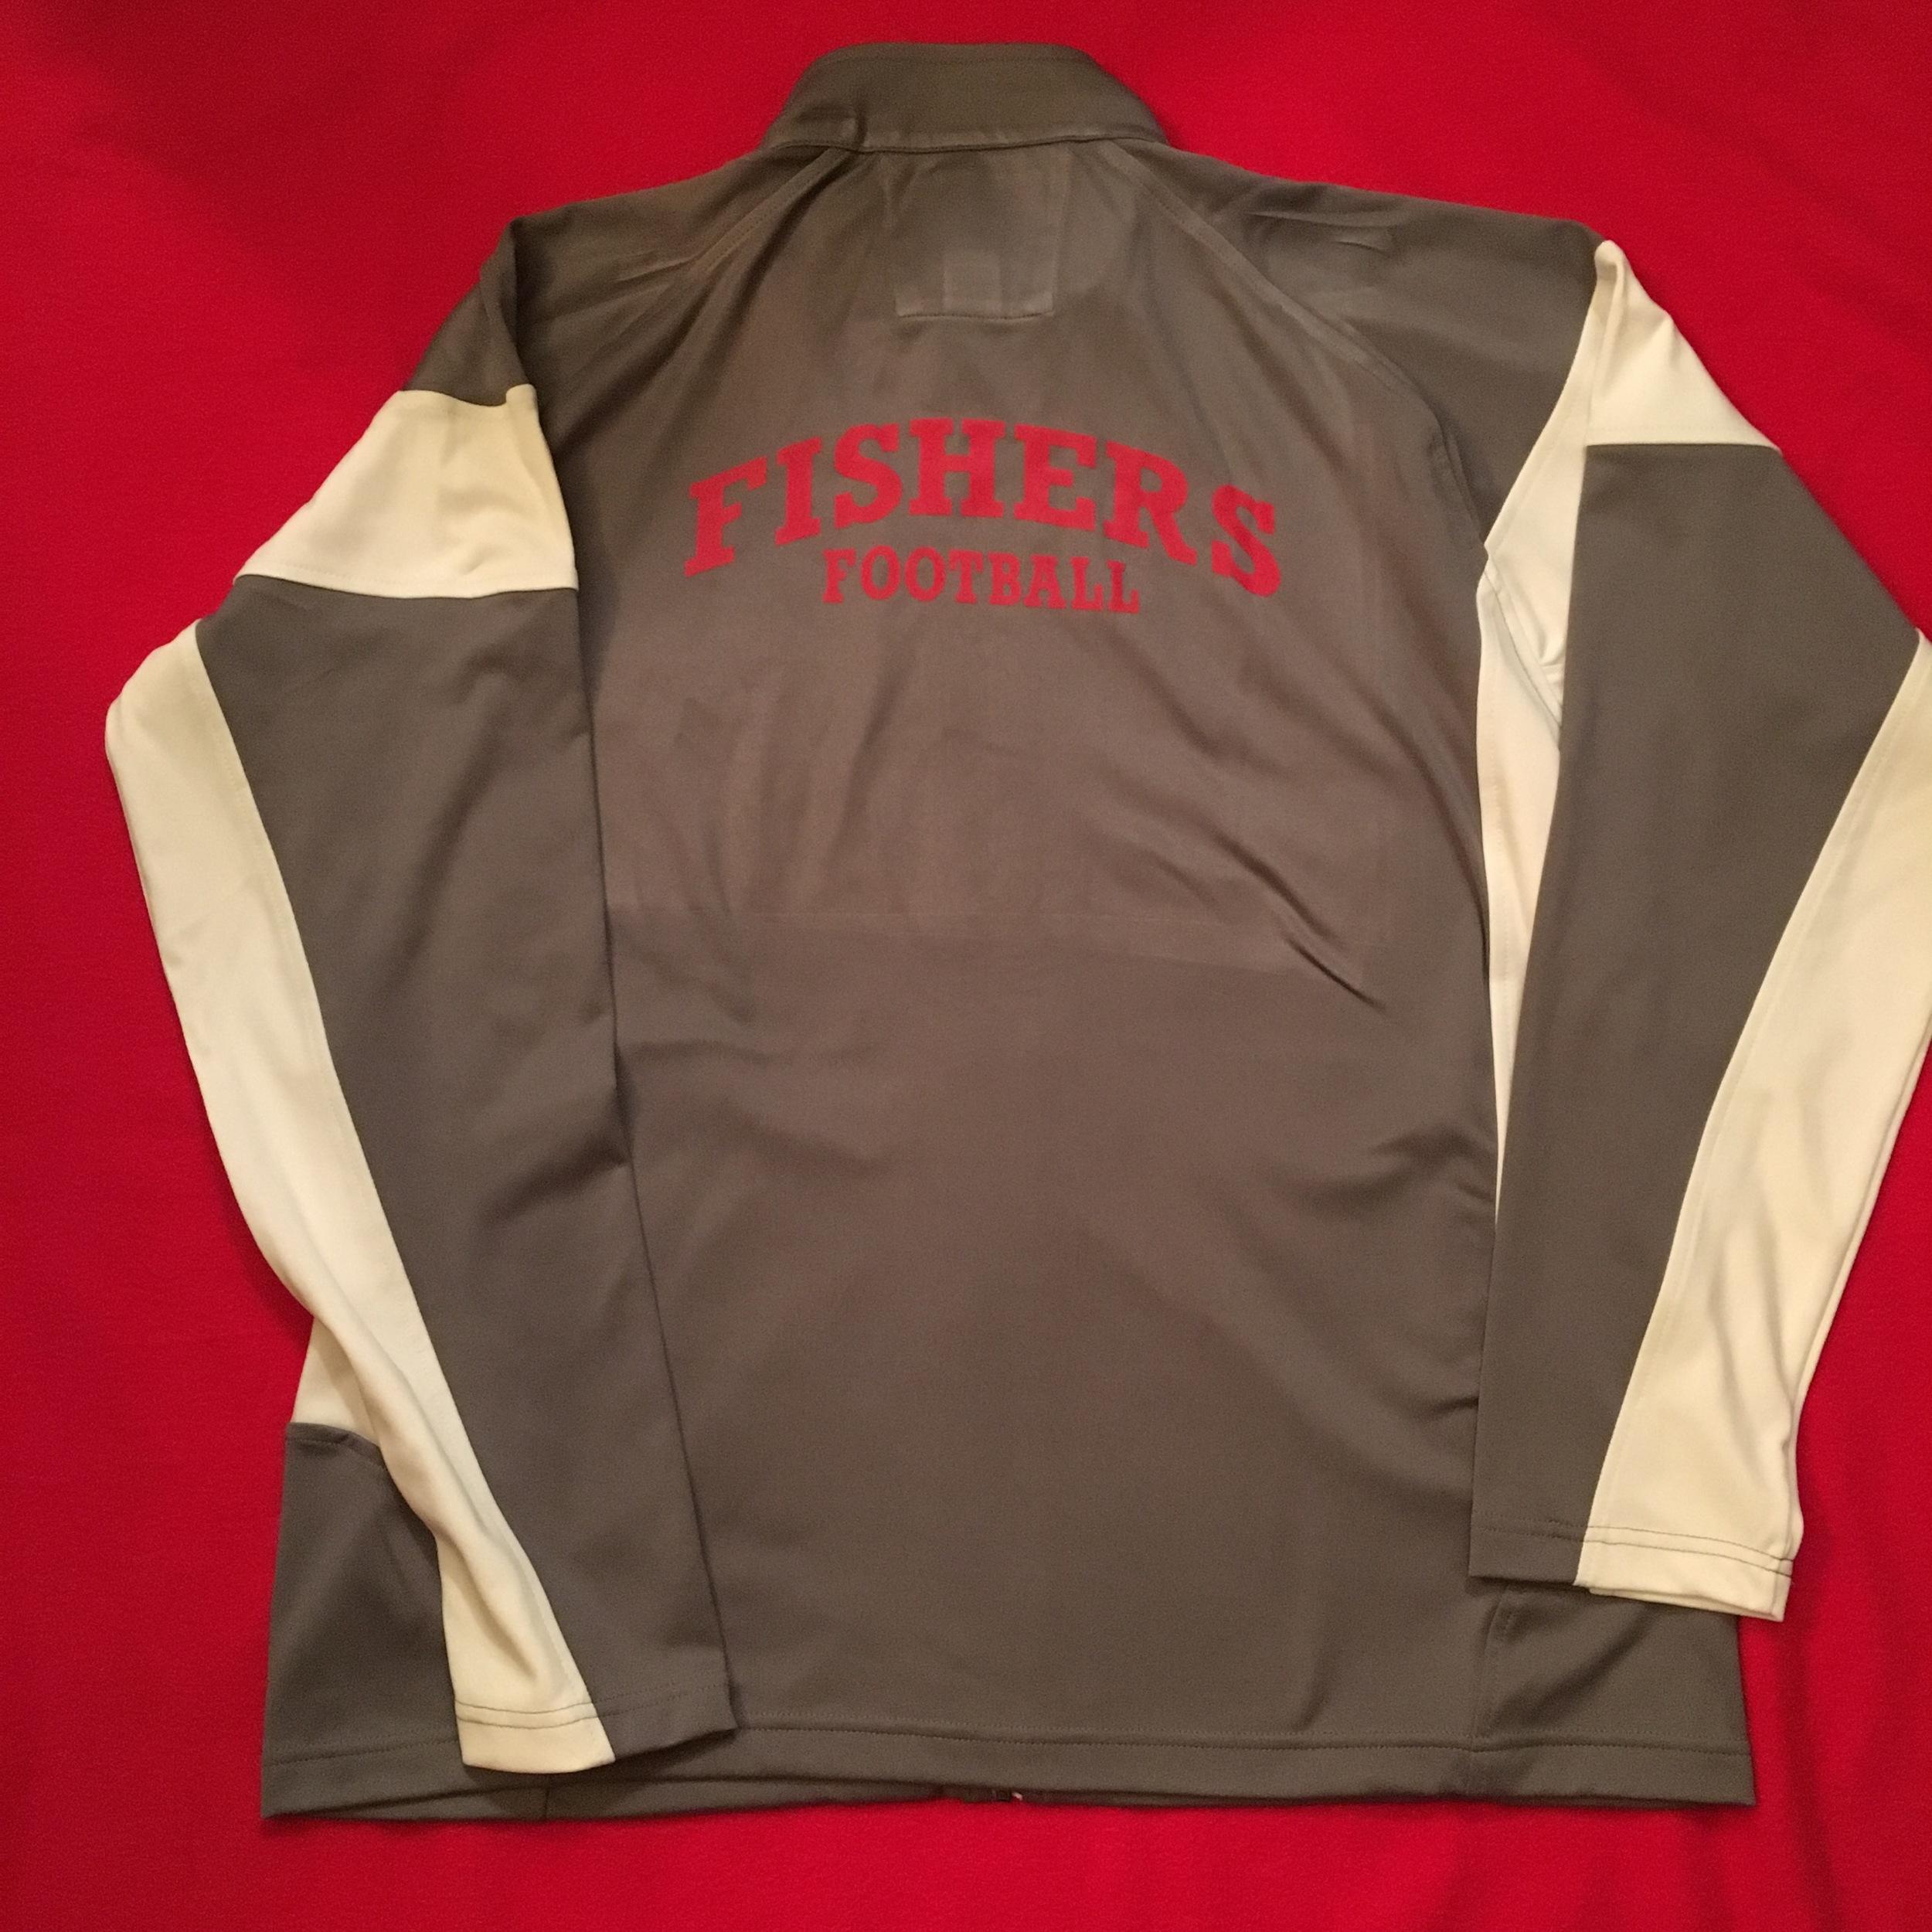 SW Men's grey/white full zip jacket w/ back logo